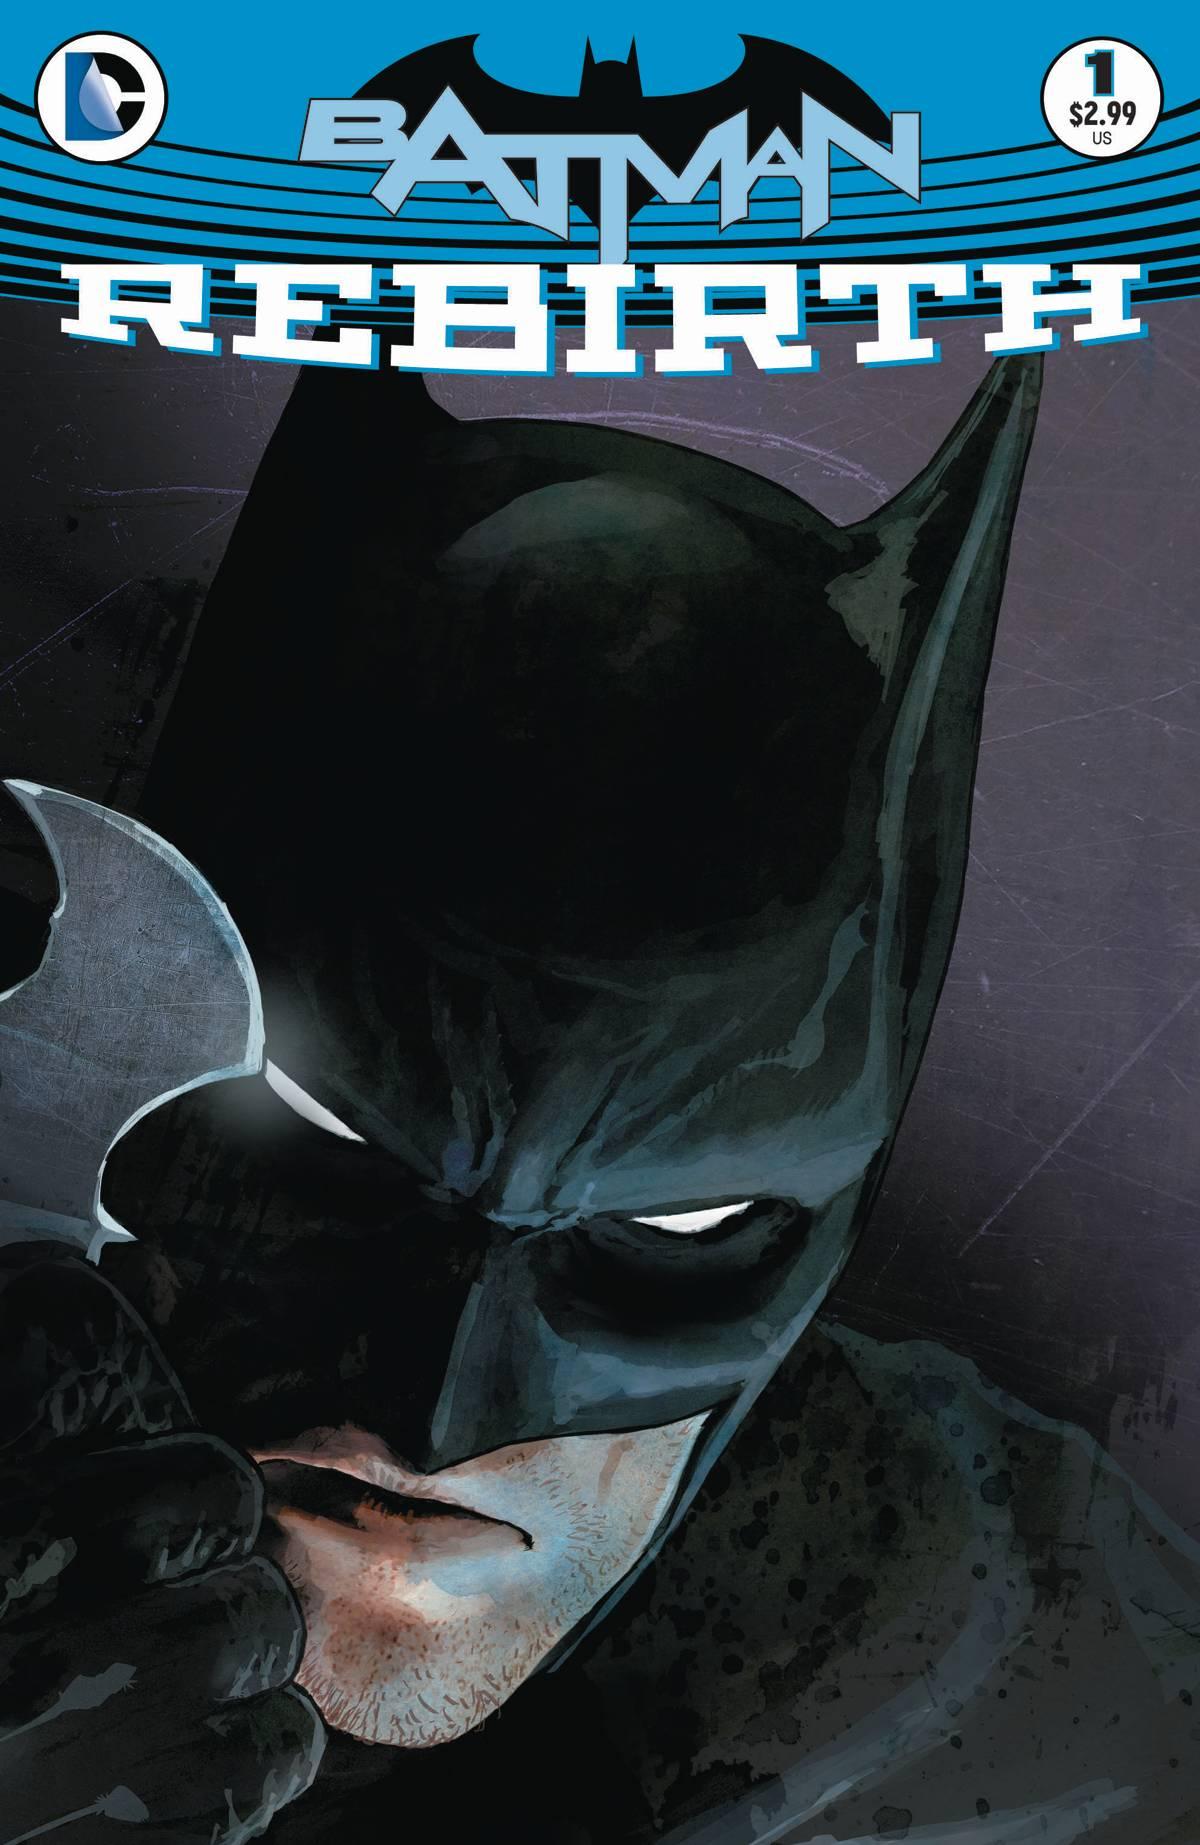 Batman Vol 3 Rebirth #1 Cover A Mikel Janin (REBIRTH)